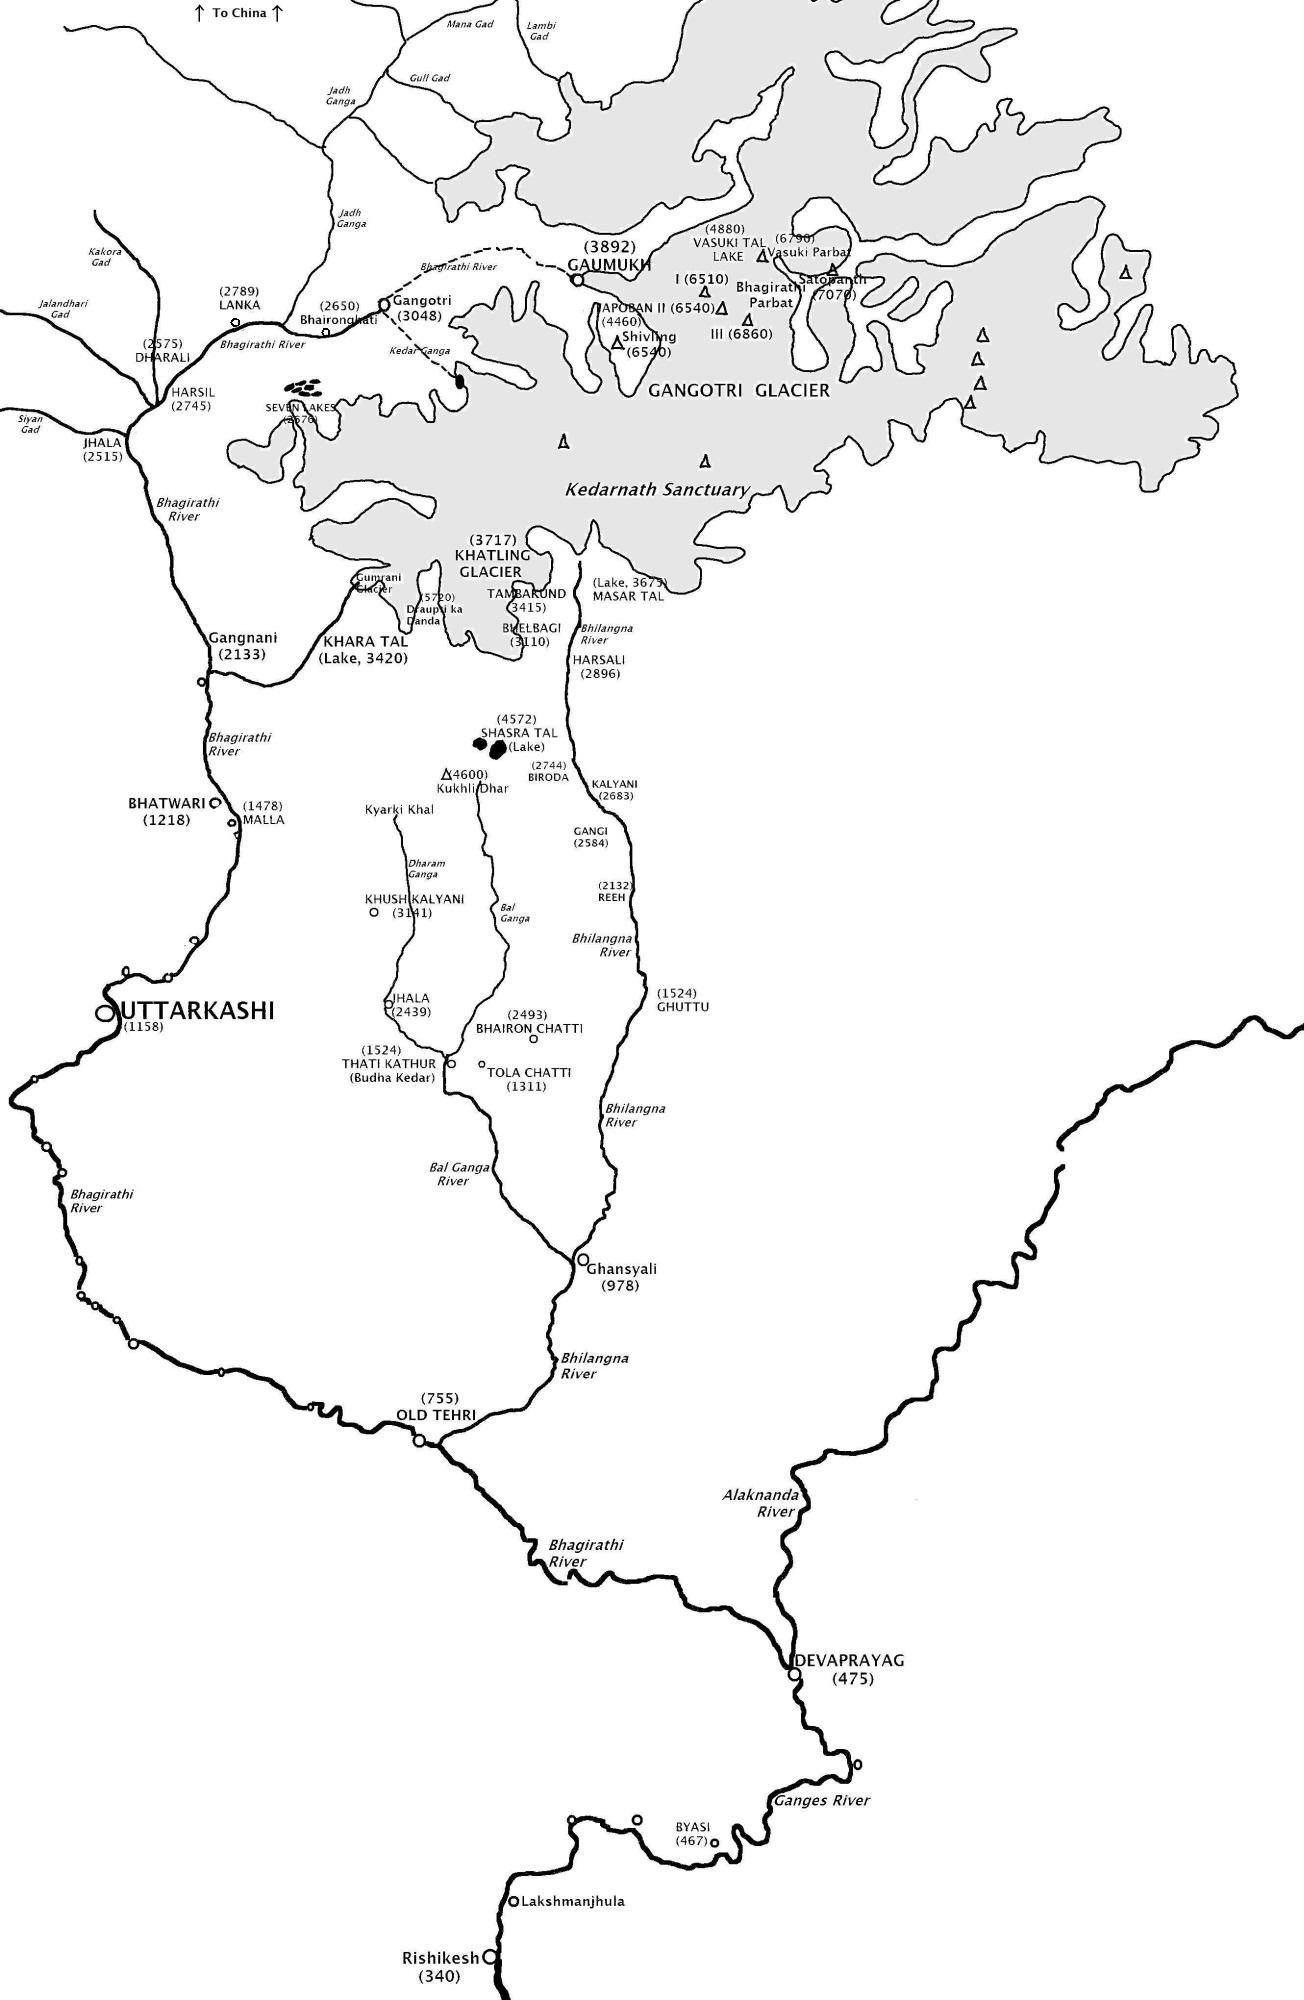 FileBhagirathi river mapJPG  Wikimedia Commons